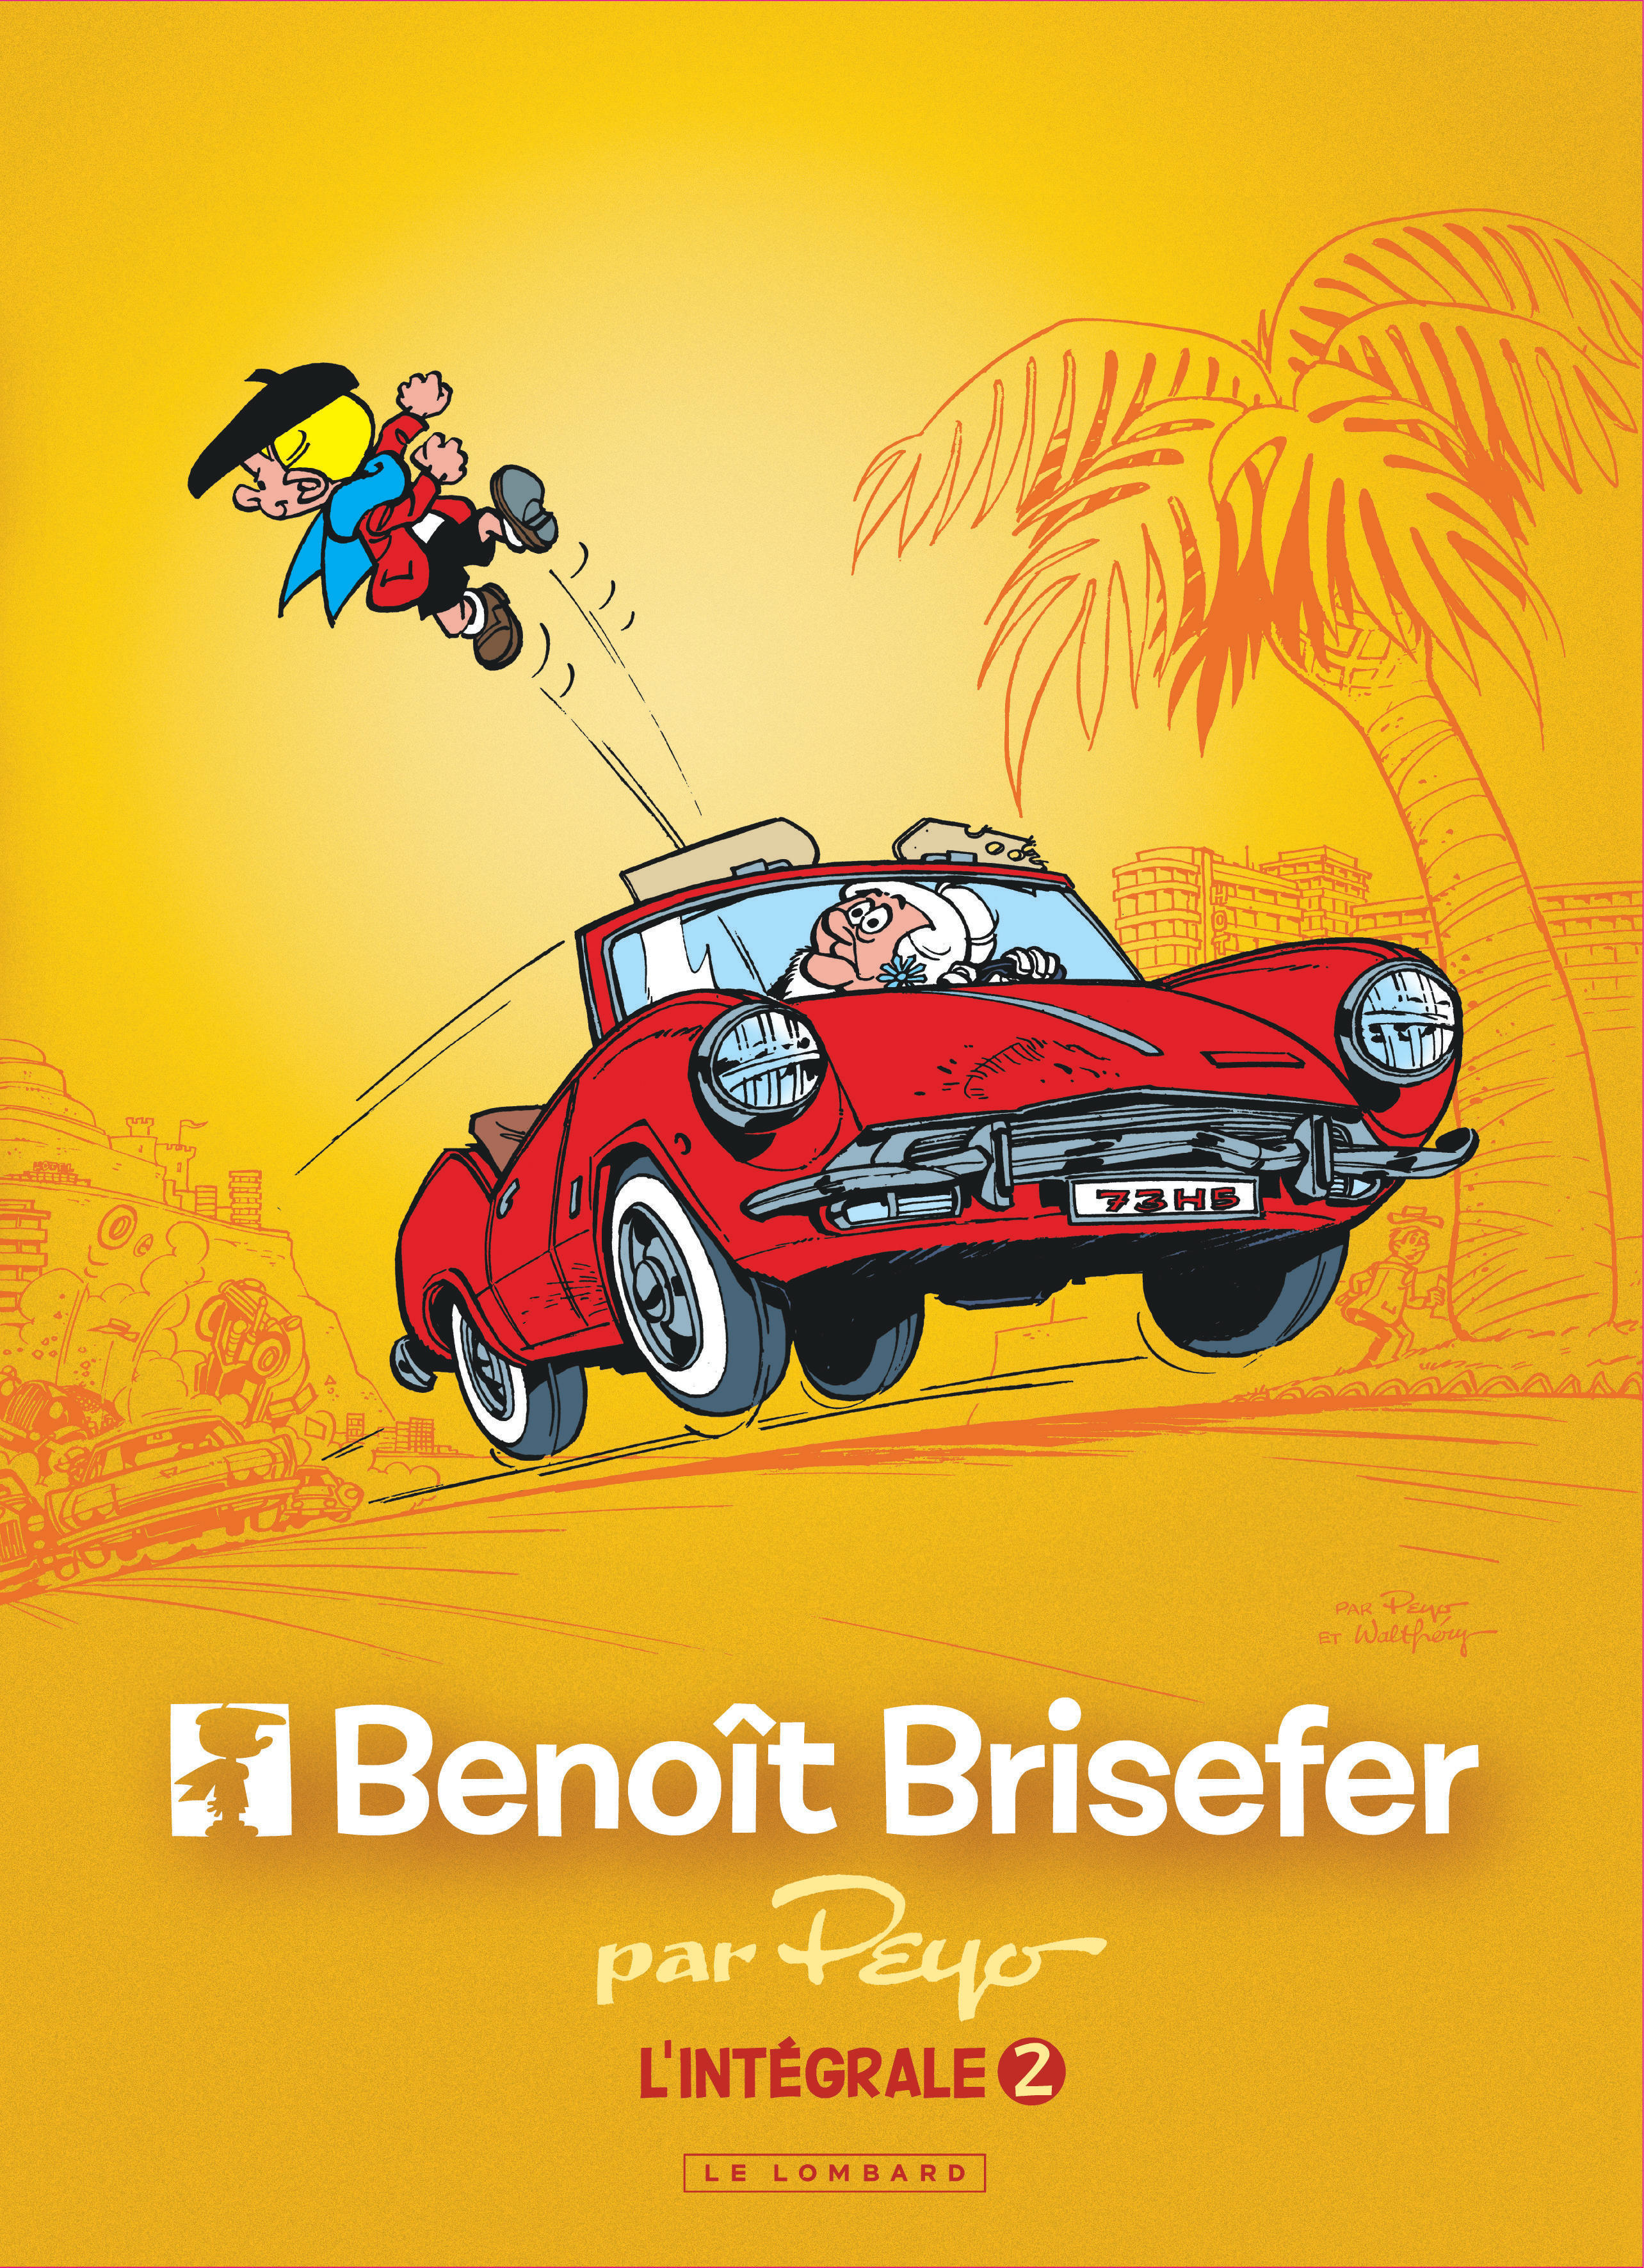 INTEGRALE BENOIT BRISEFER - TOME 2 - INTEGRALE BENOIT BRISEFER 2